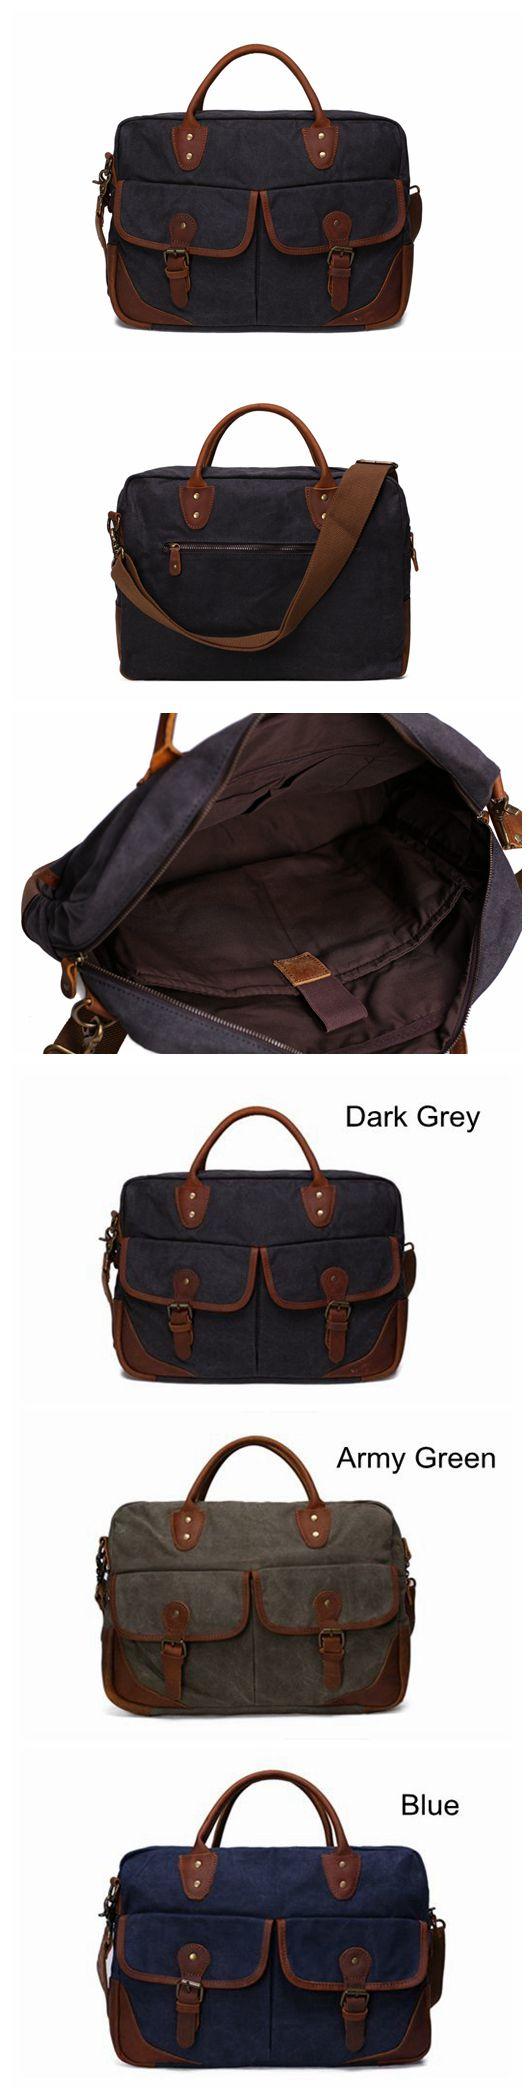 Waxed Canvas Leather Messenger Bag, Laptop Briefcase, Shoulder Bag YD2169